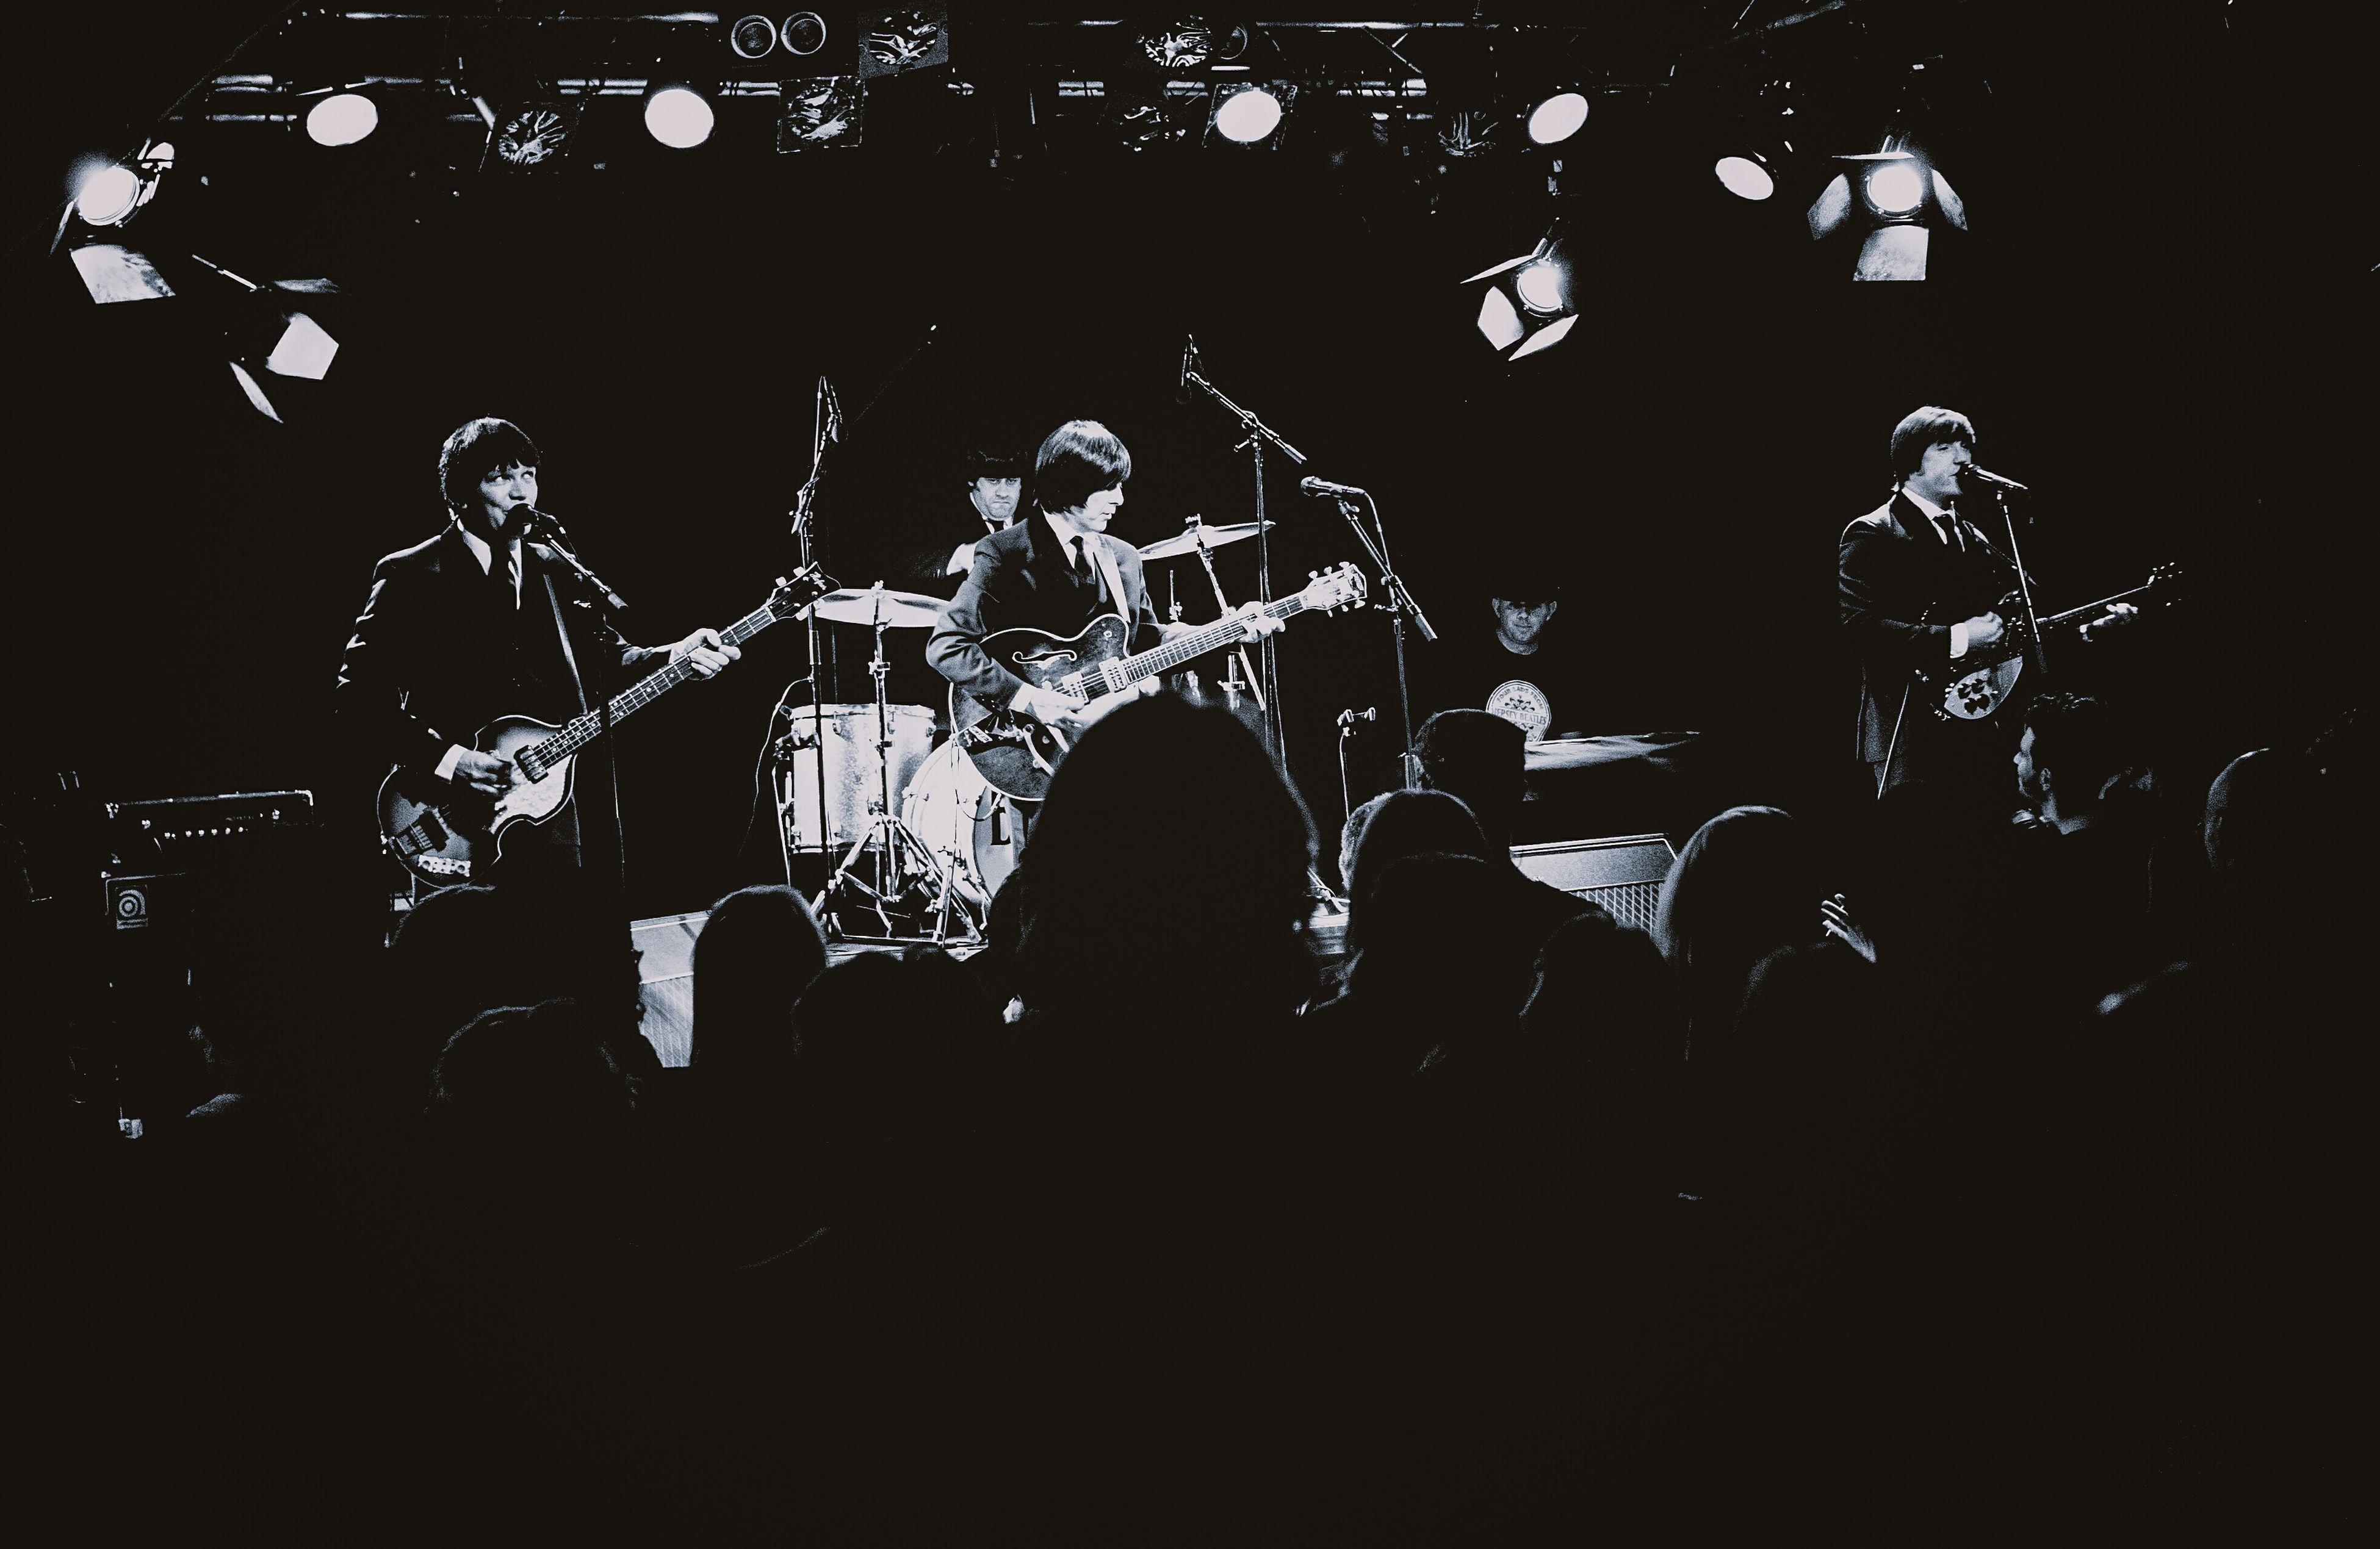 The Mersey Beatles, Katalin, May 15, 2015 Blackandwhite Concert The Beatles Music 1966